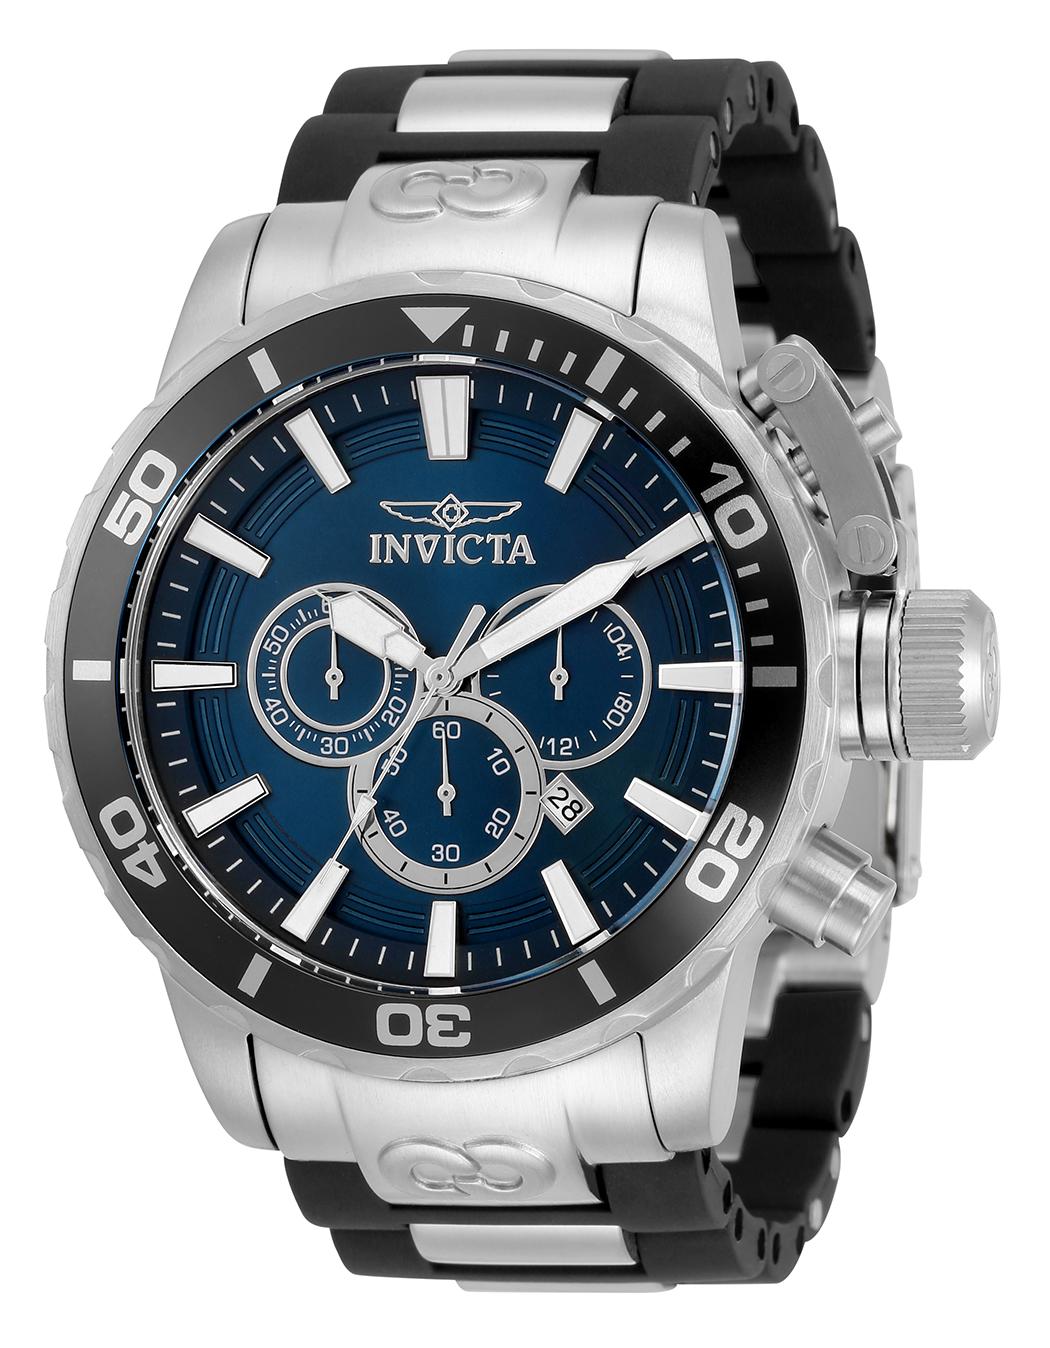 Invicta Corduba Quartz Mens Watch - 52mm Stainless Steel Case, Stainless Steel/Polyurethane Band, Black, Steel (33691)